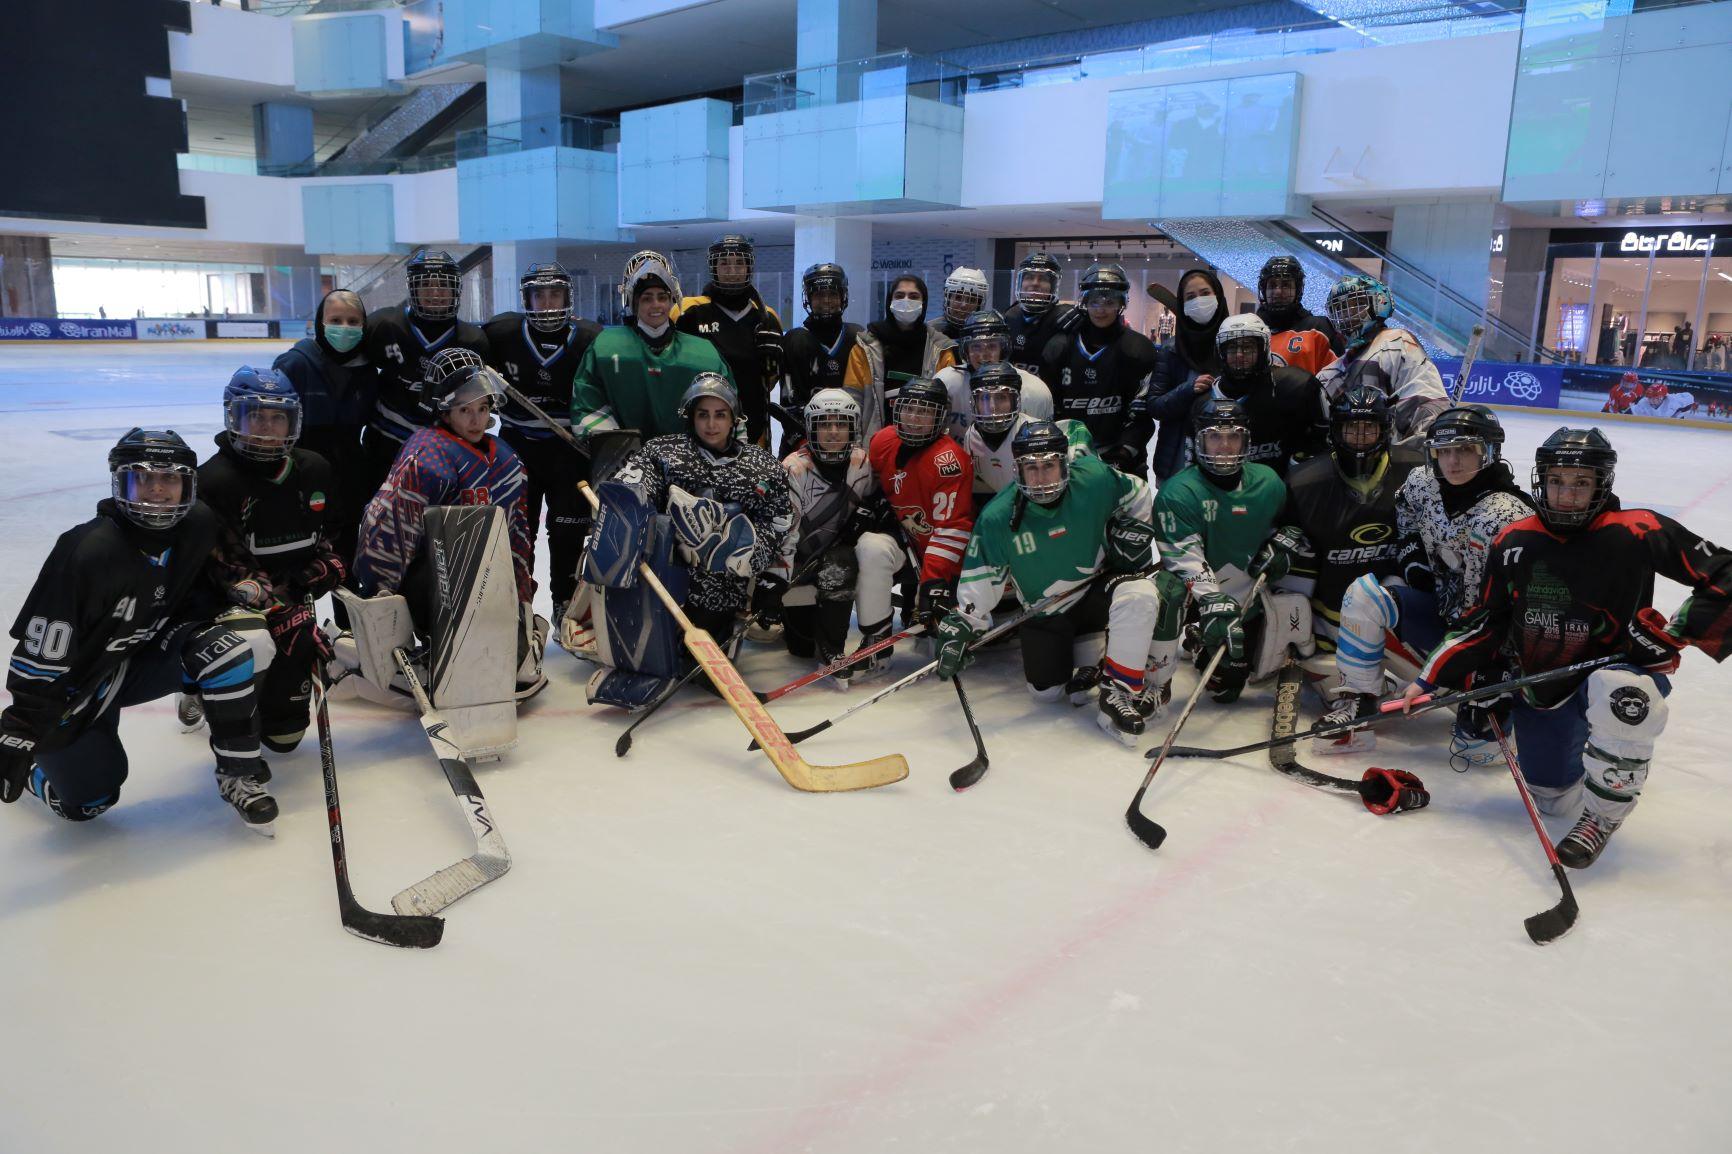 Iran women's hockey team